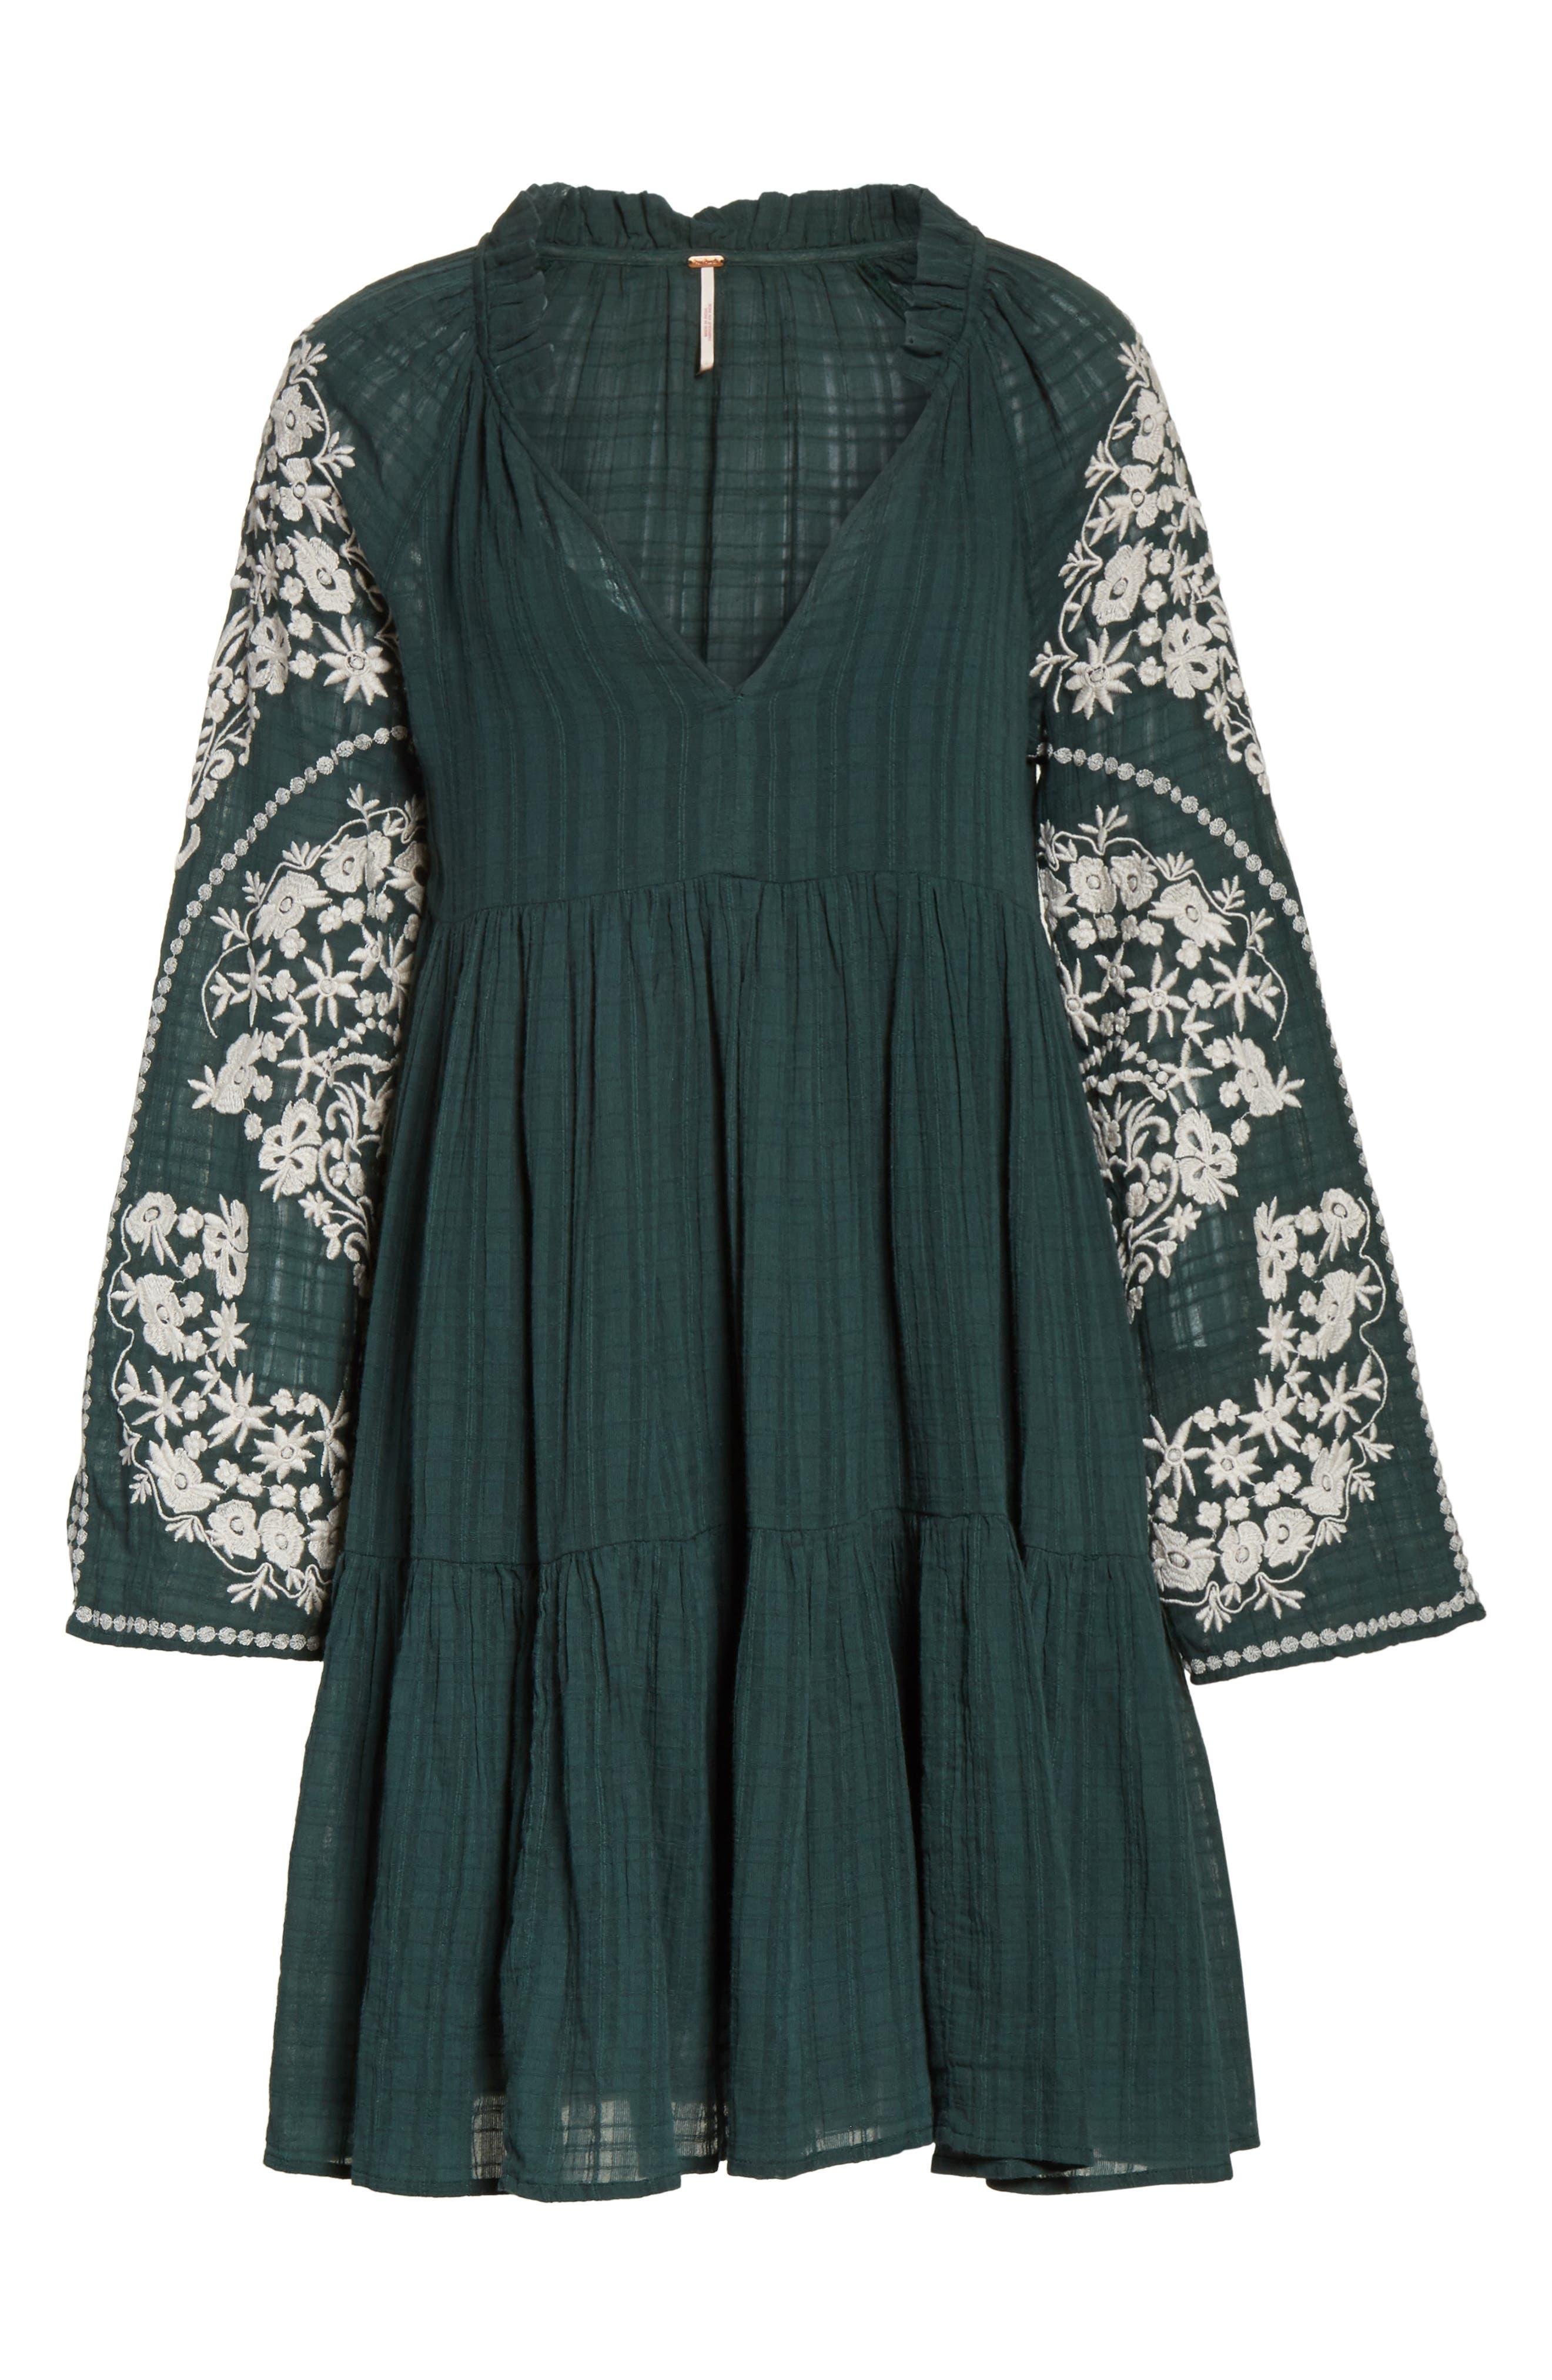 Emerald City Shift Dress,                             Alternate thumbnail 7, color,                             300